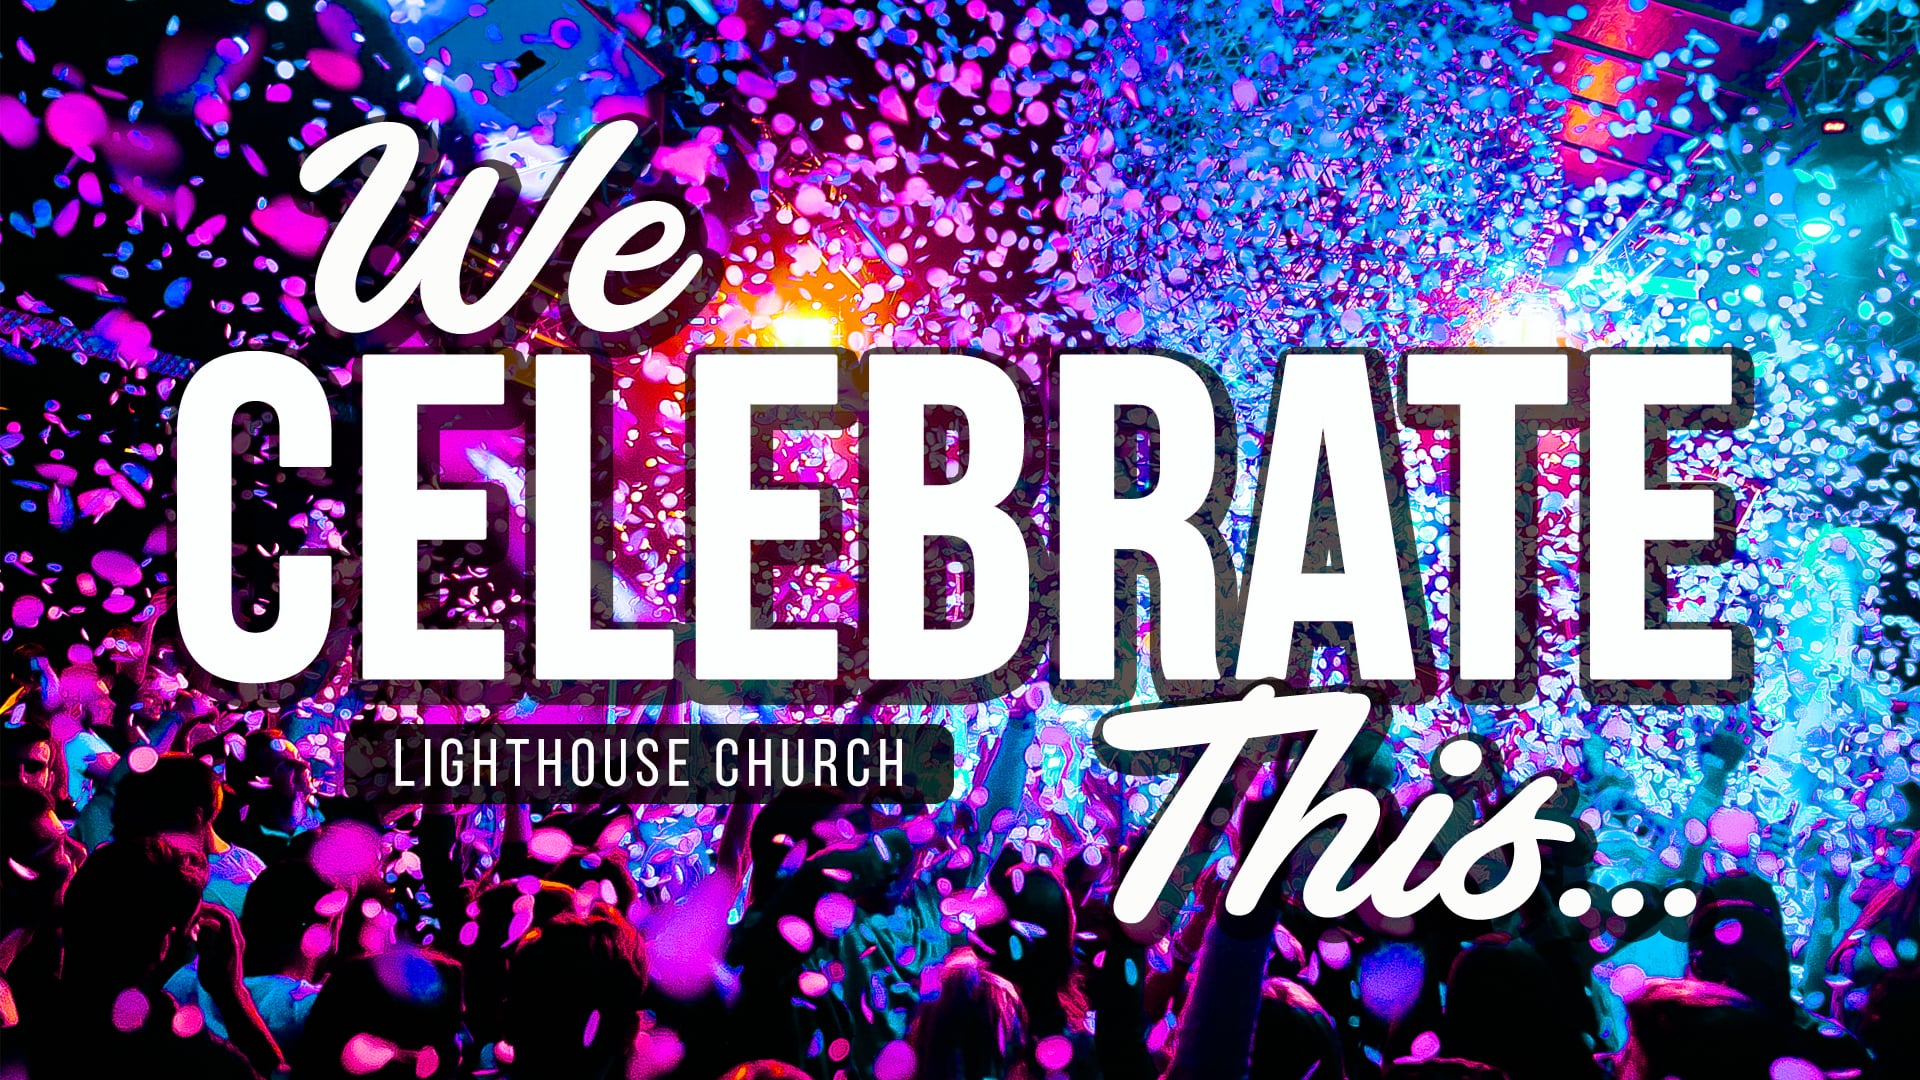 We Celebrate This - Part 3 - Grace